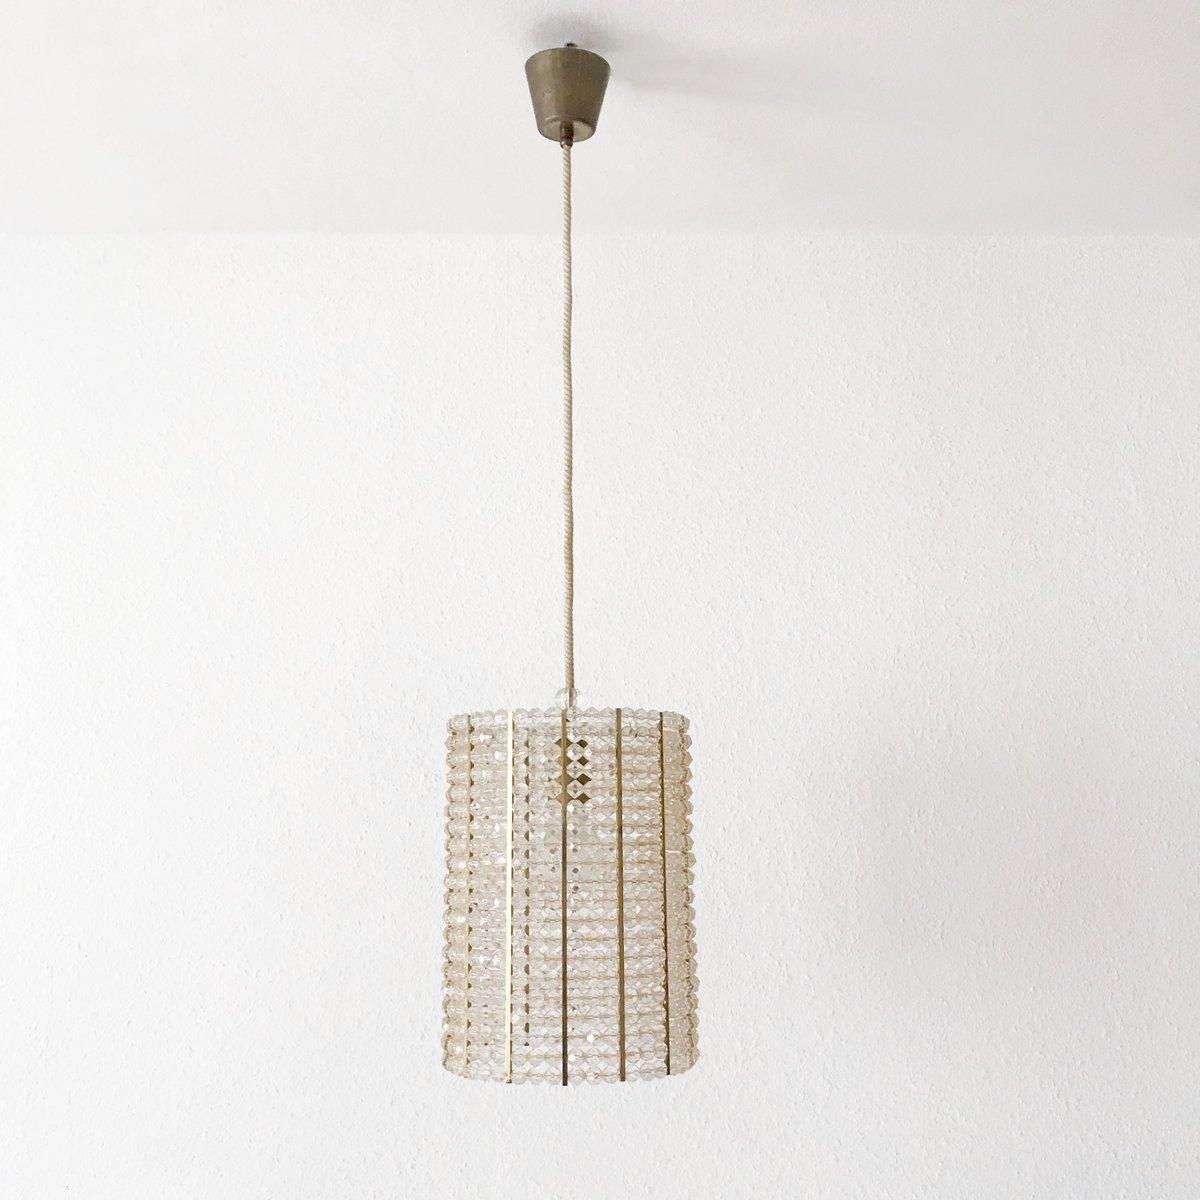 mid century pendant lighting. Mid-Century Modern Pendant Lamp, 1950s Mid Century Lighting 6